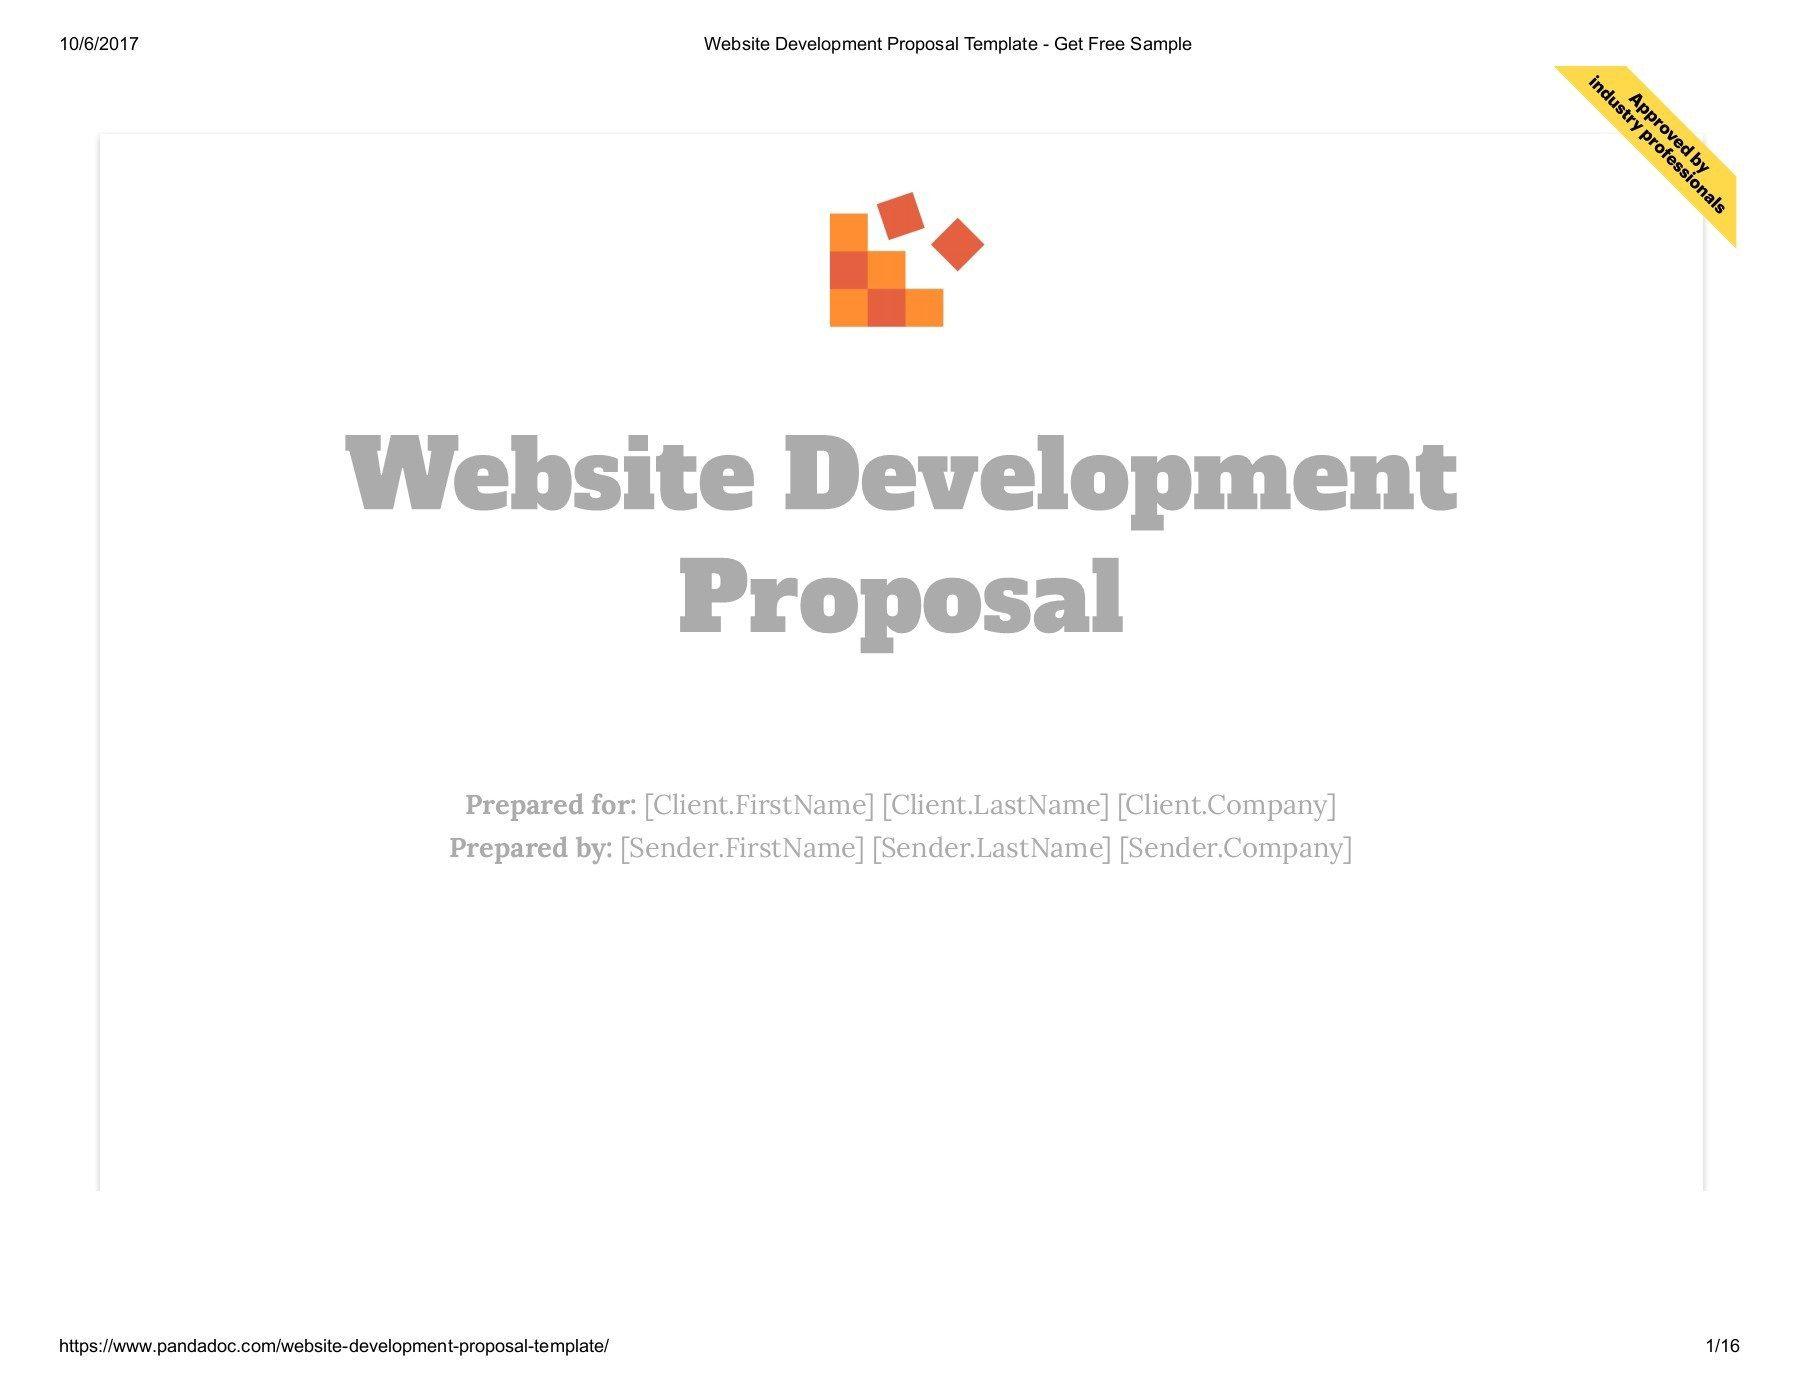 001 Surprising Website Development Proposal Template Free Example  WordFull